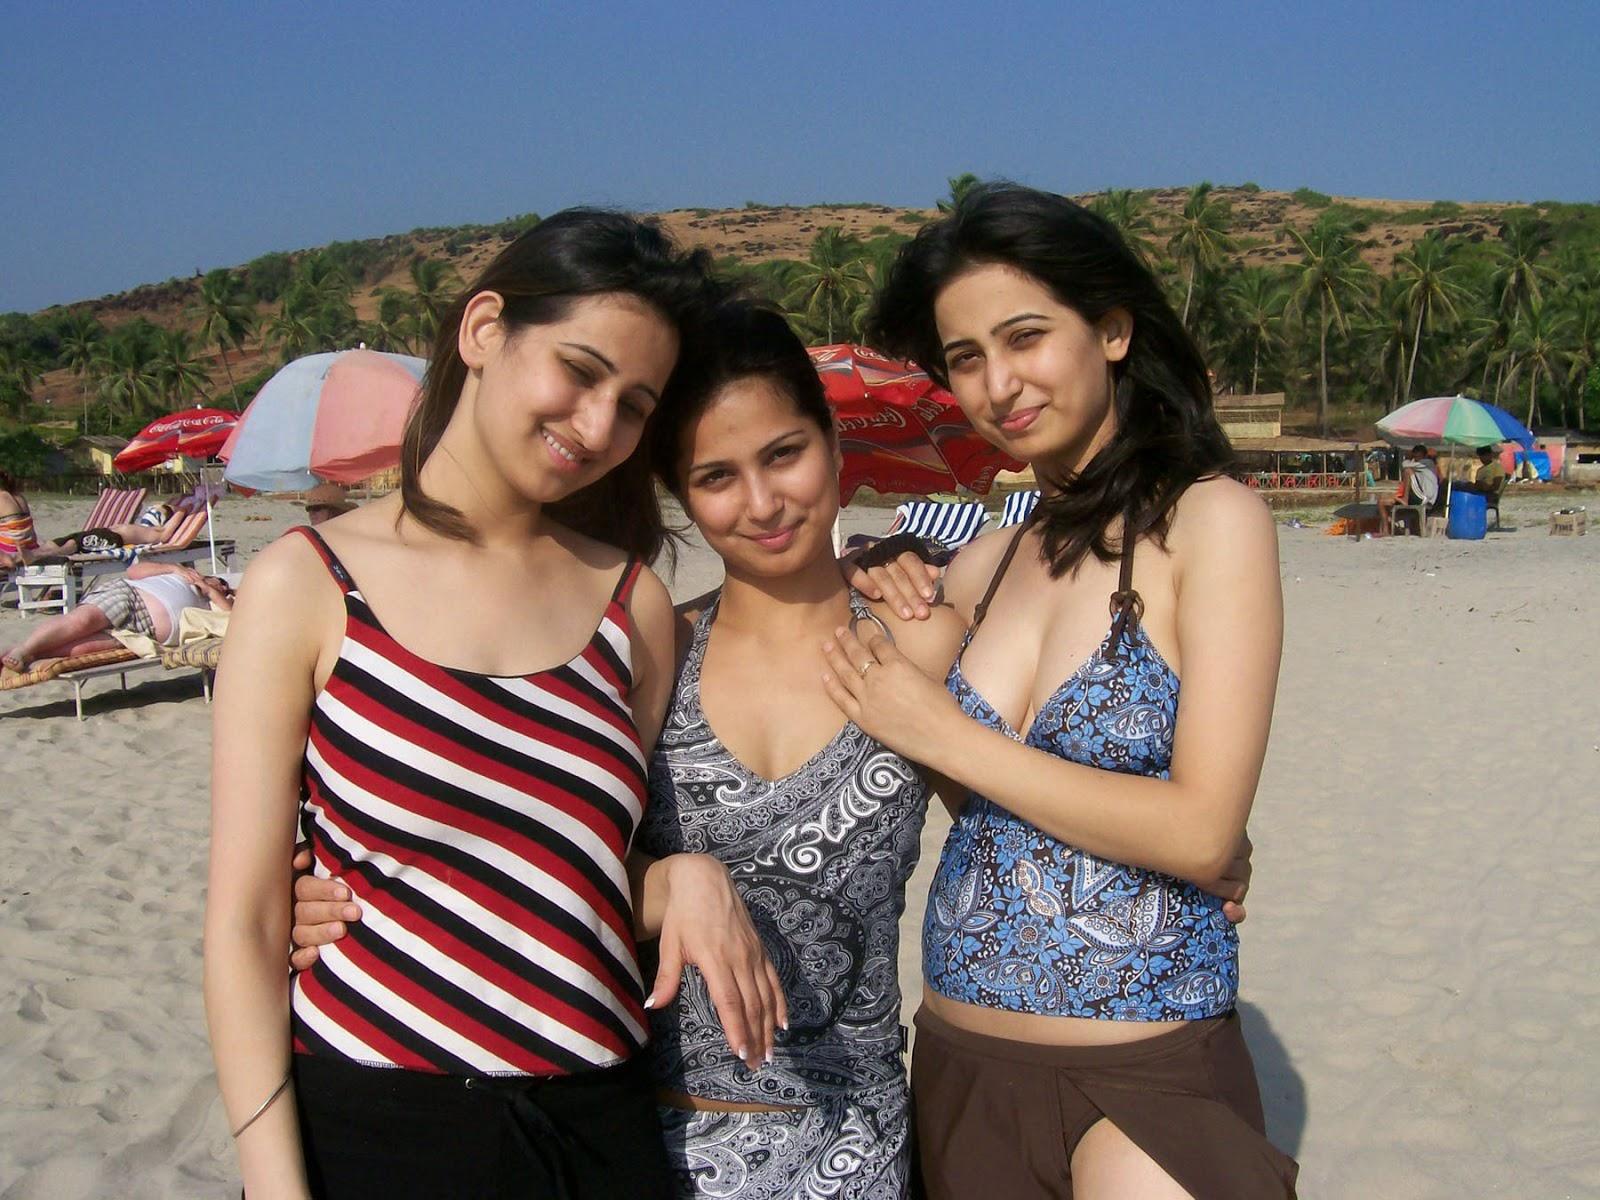 Desi Girls Beach Bathing Naked Image  Xxx Desi Photo-6528